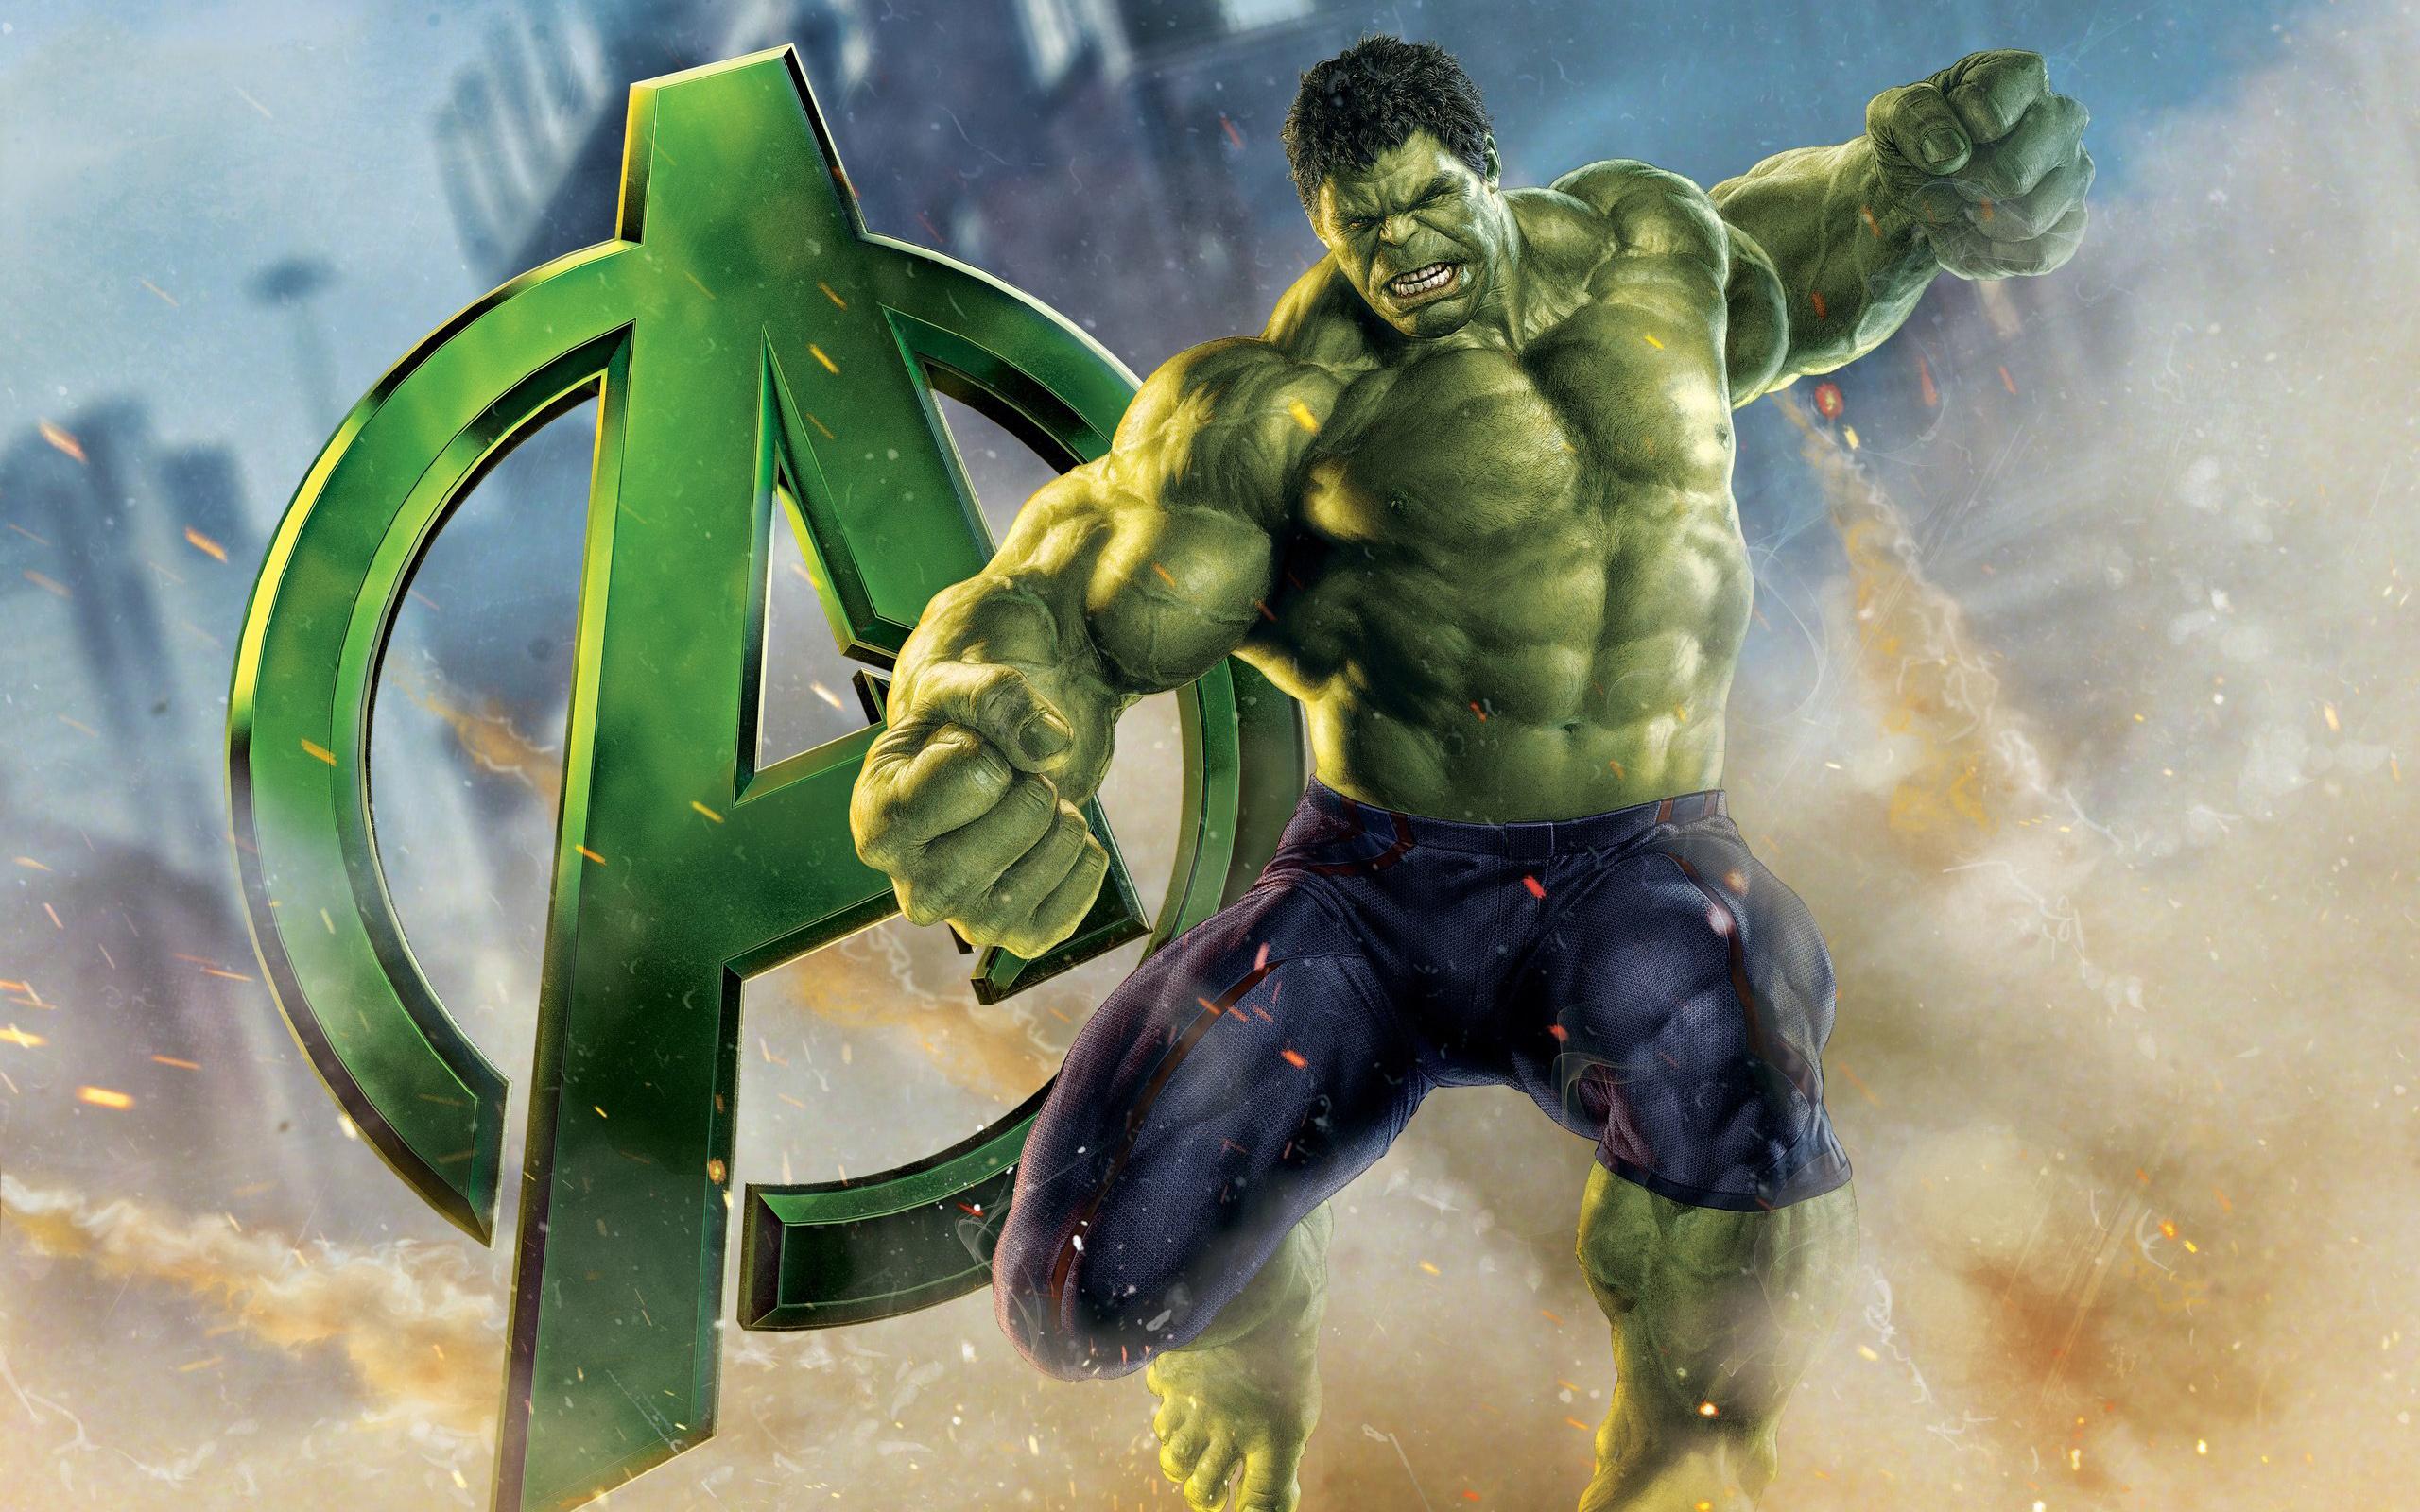 Hulk Le film avengers